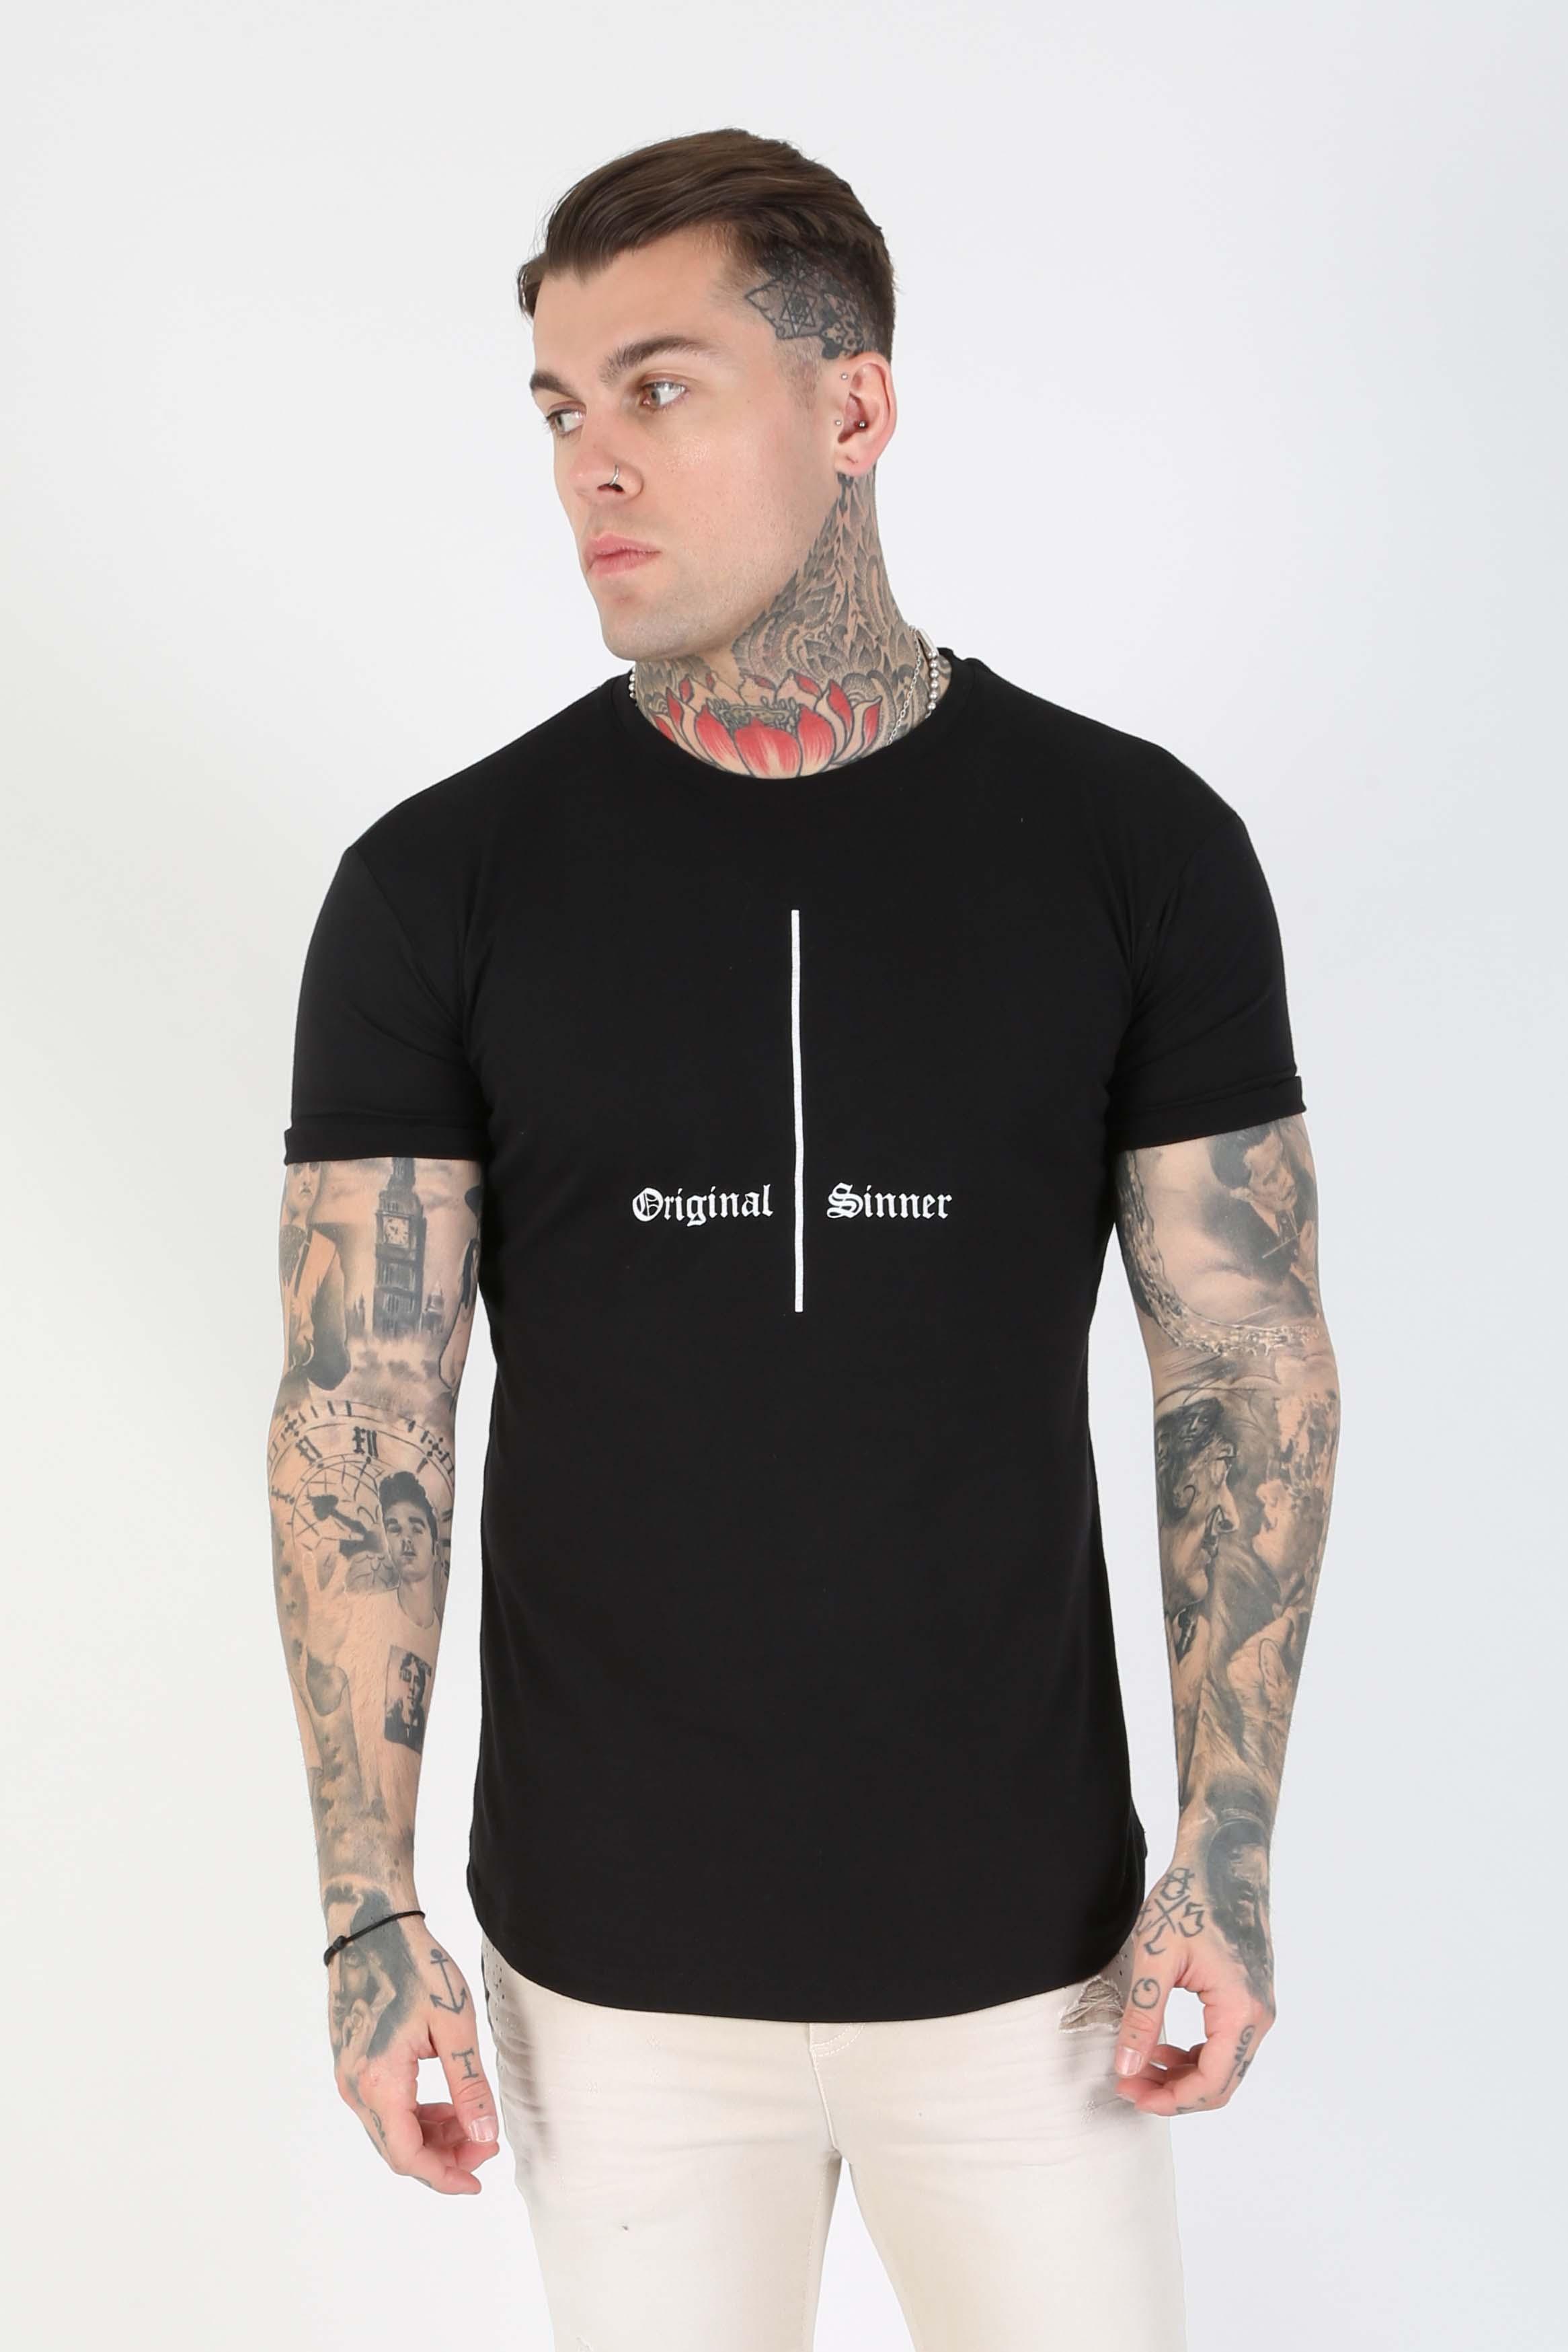 Cruci Print Fitted Men's T-Shirt - Black, Medium